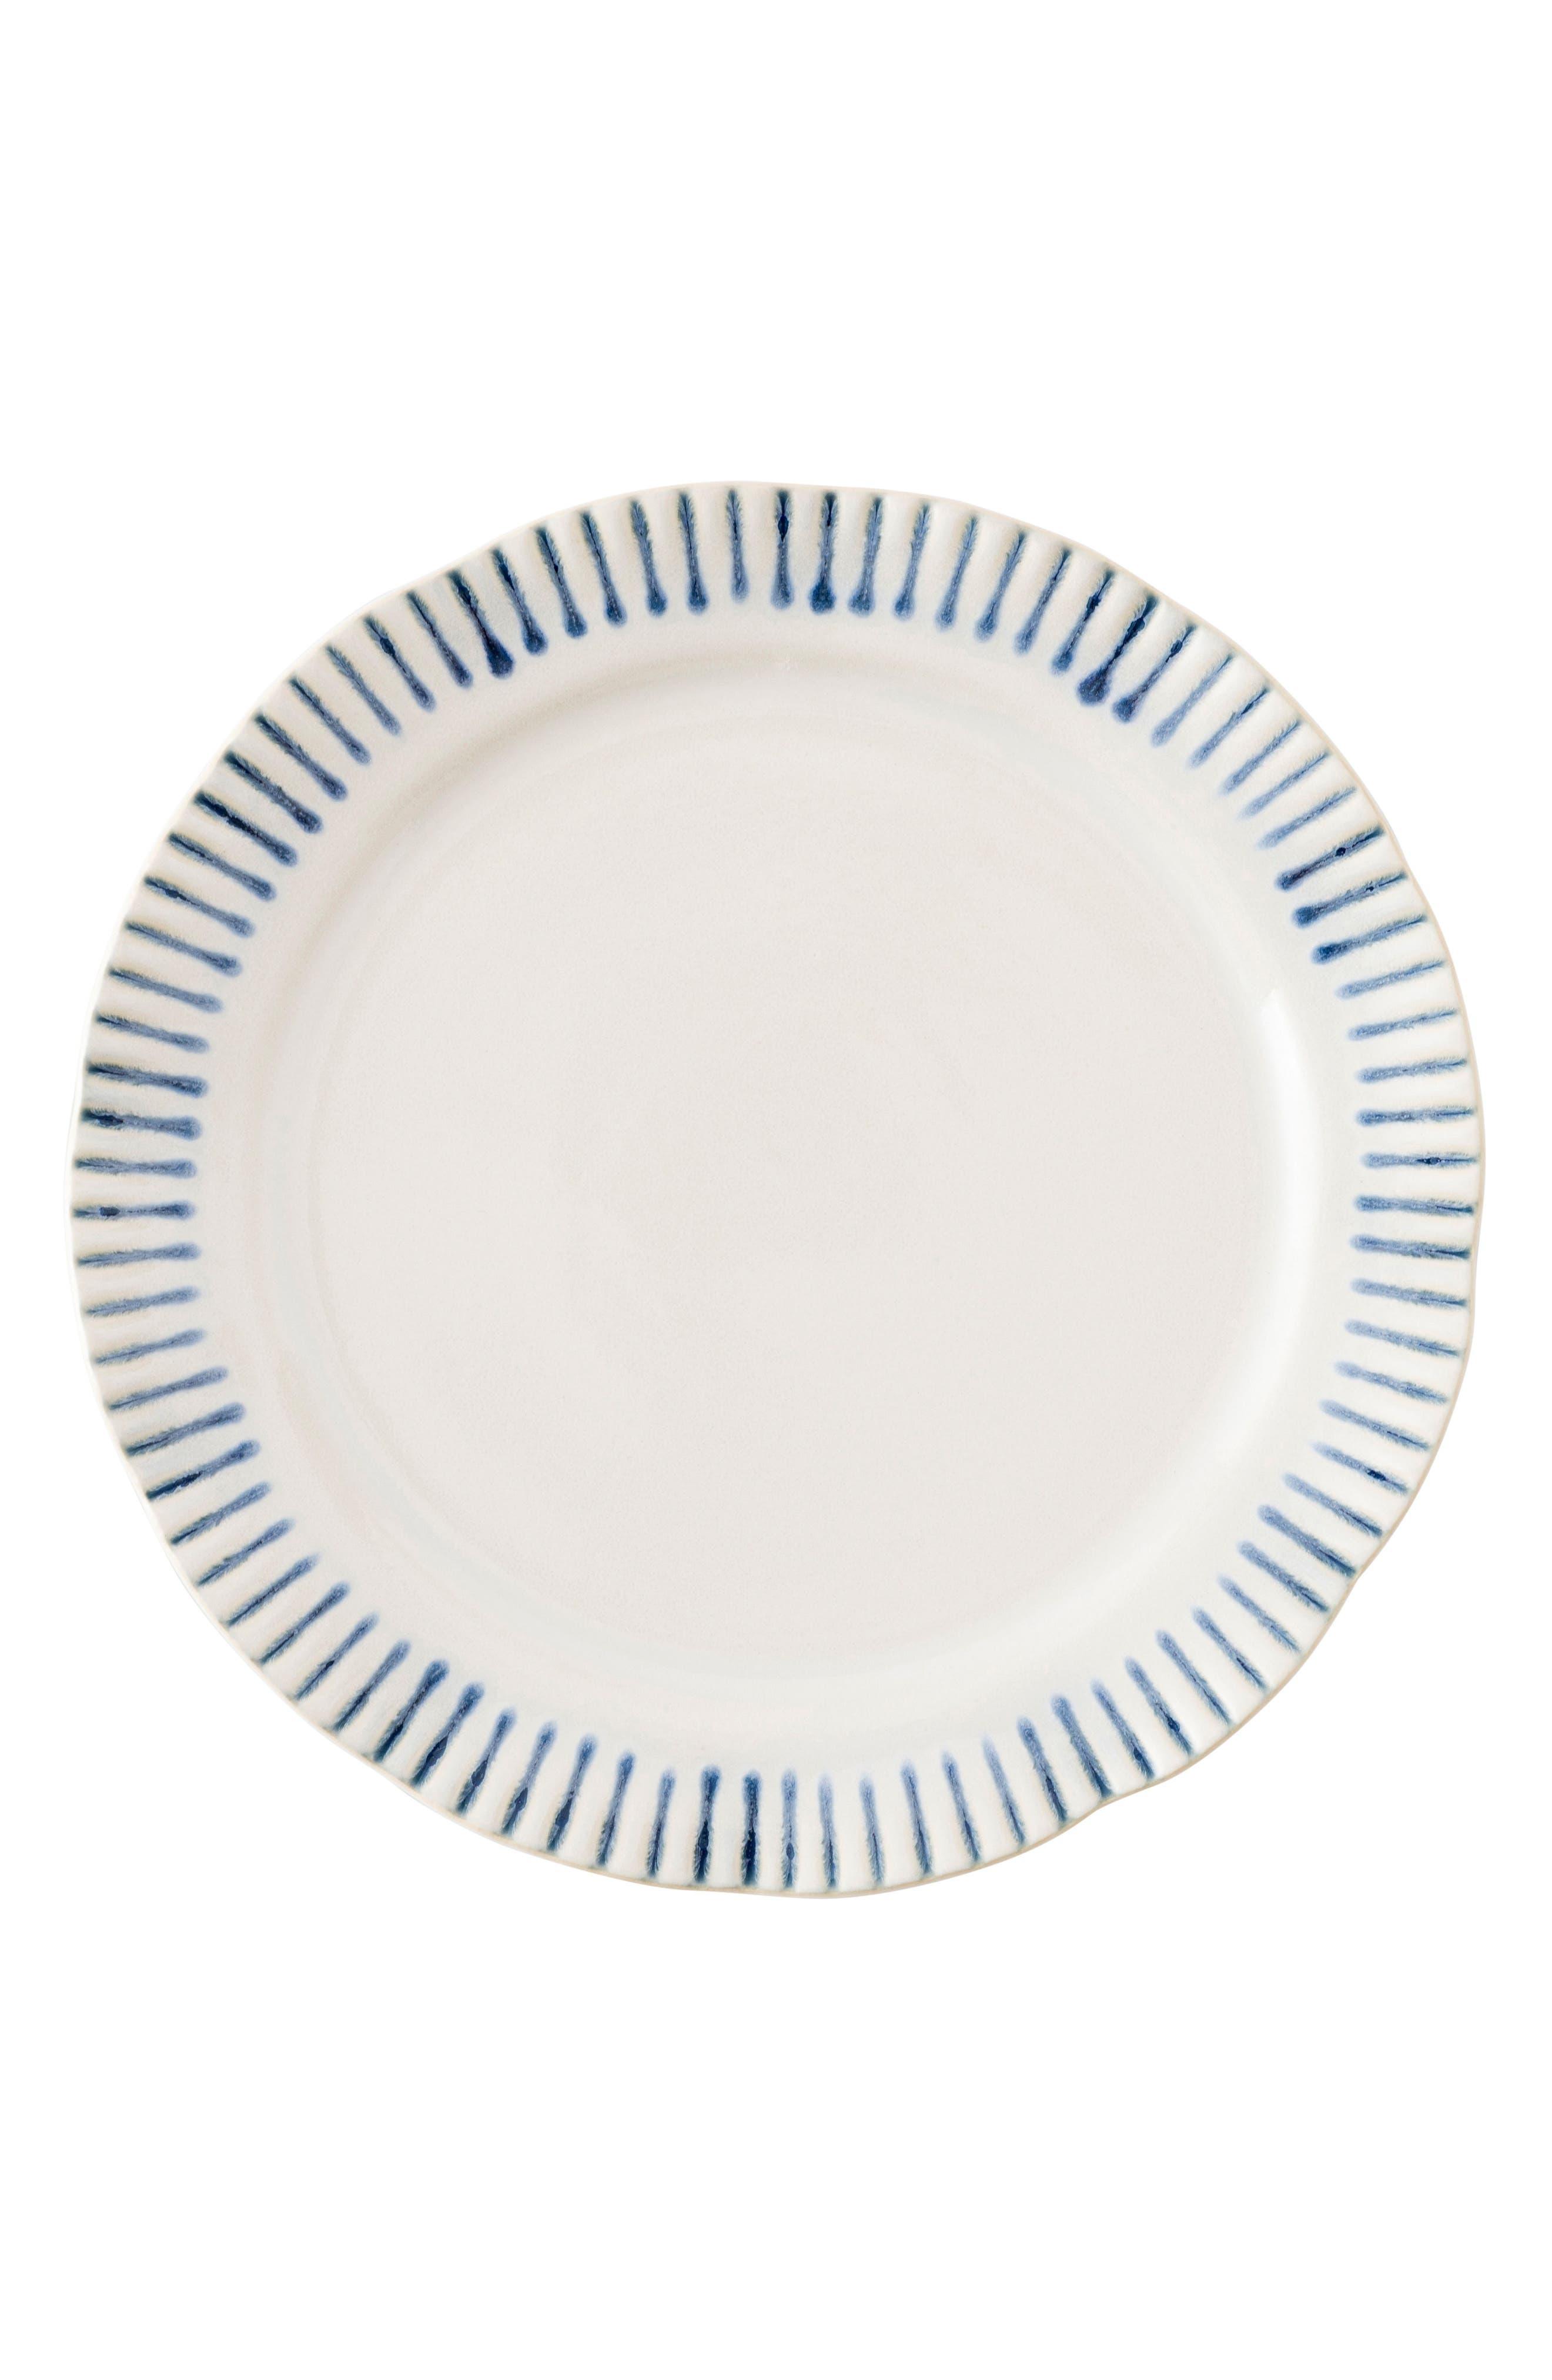 Sitio Stripe Stoneware Salad Plate,                         Main,                         color, Indigo